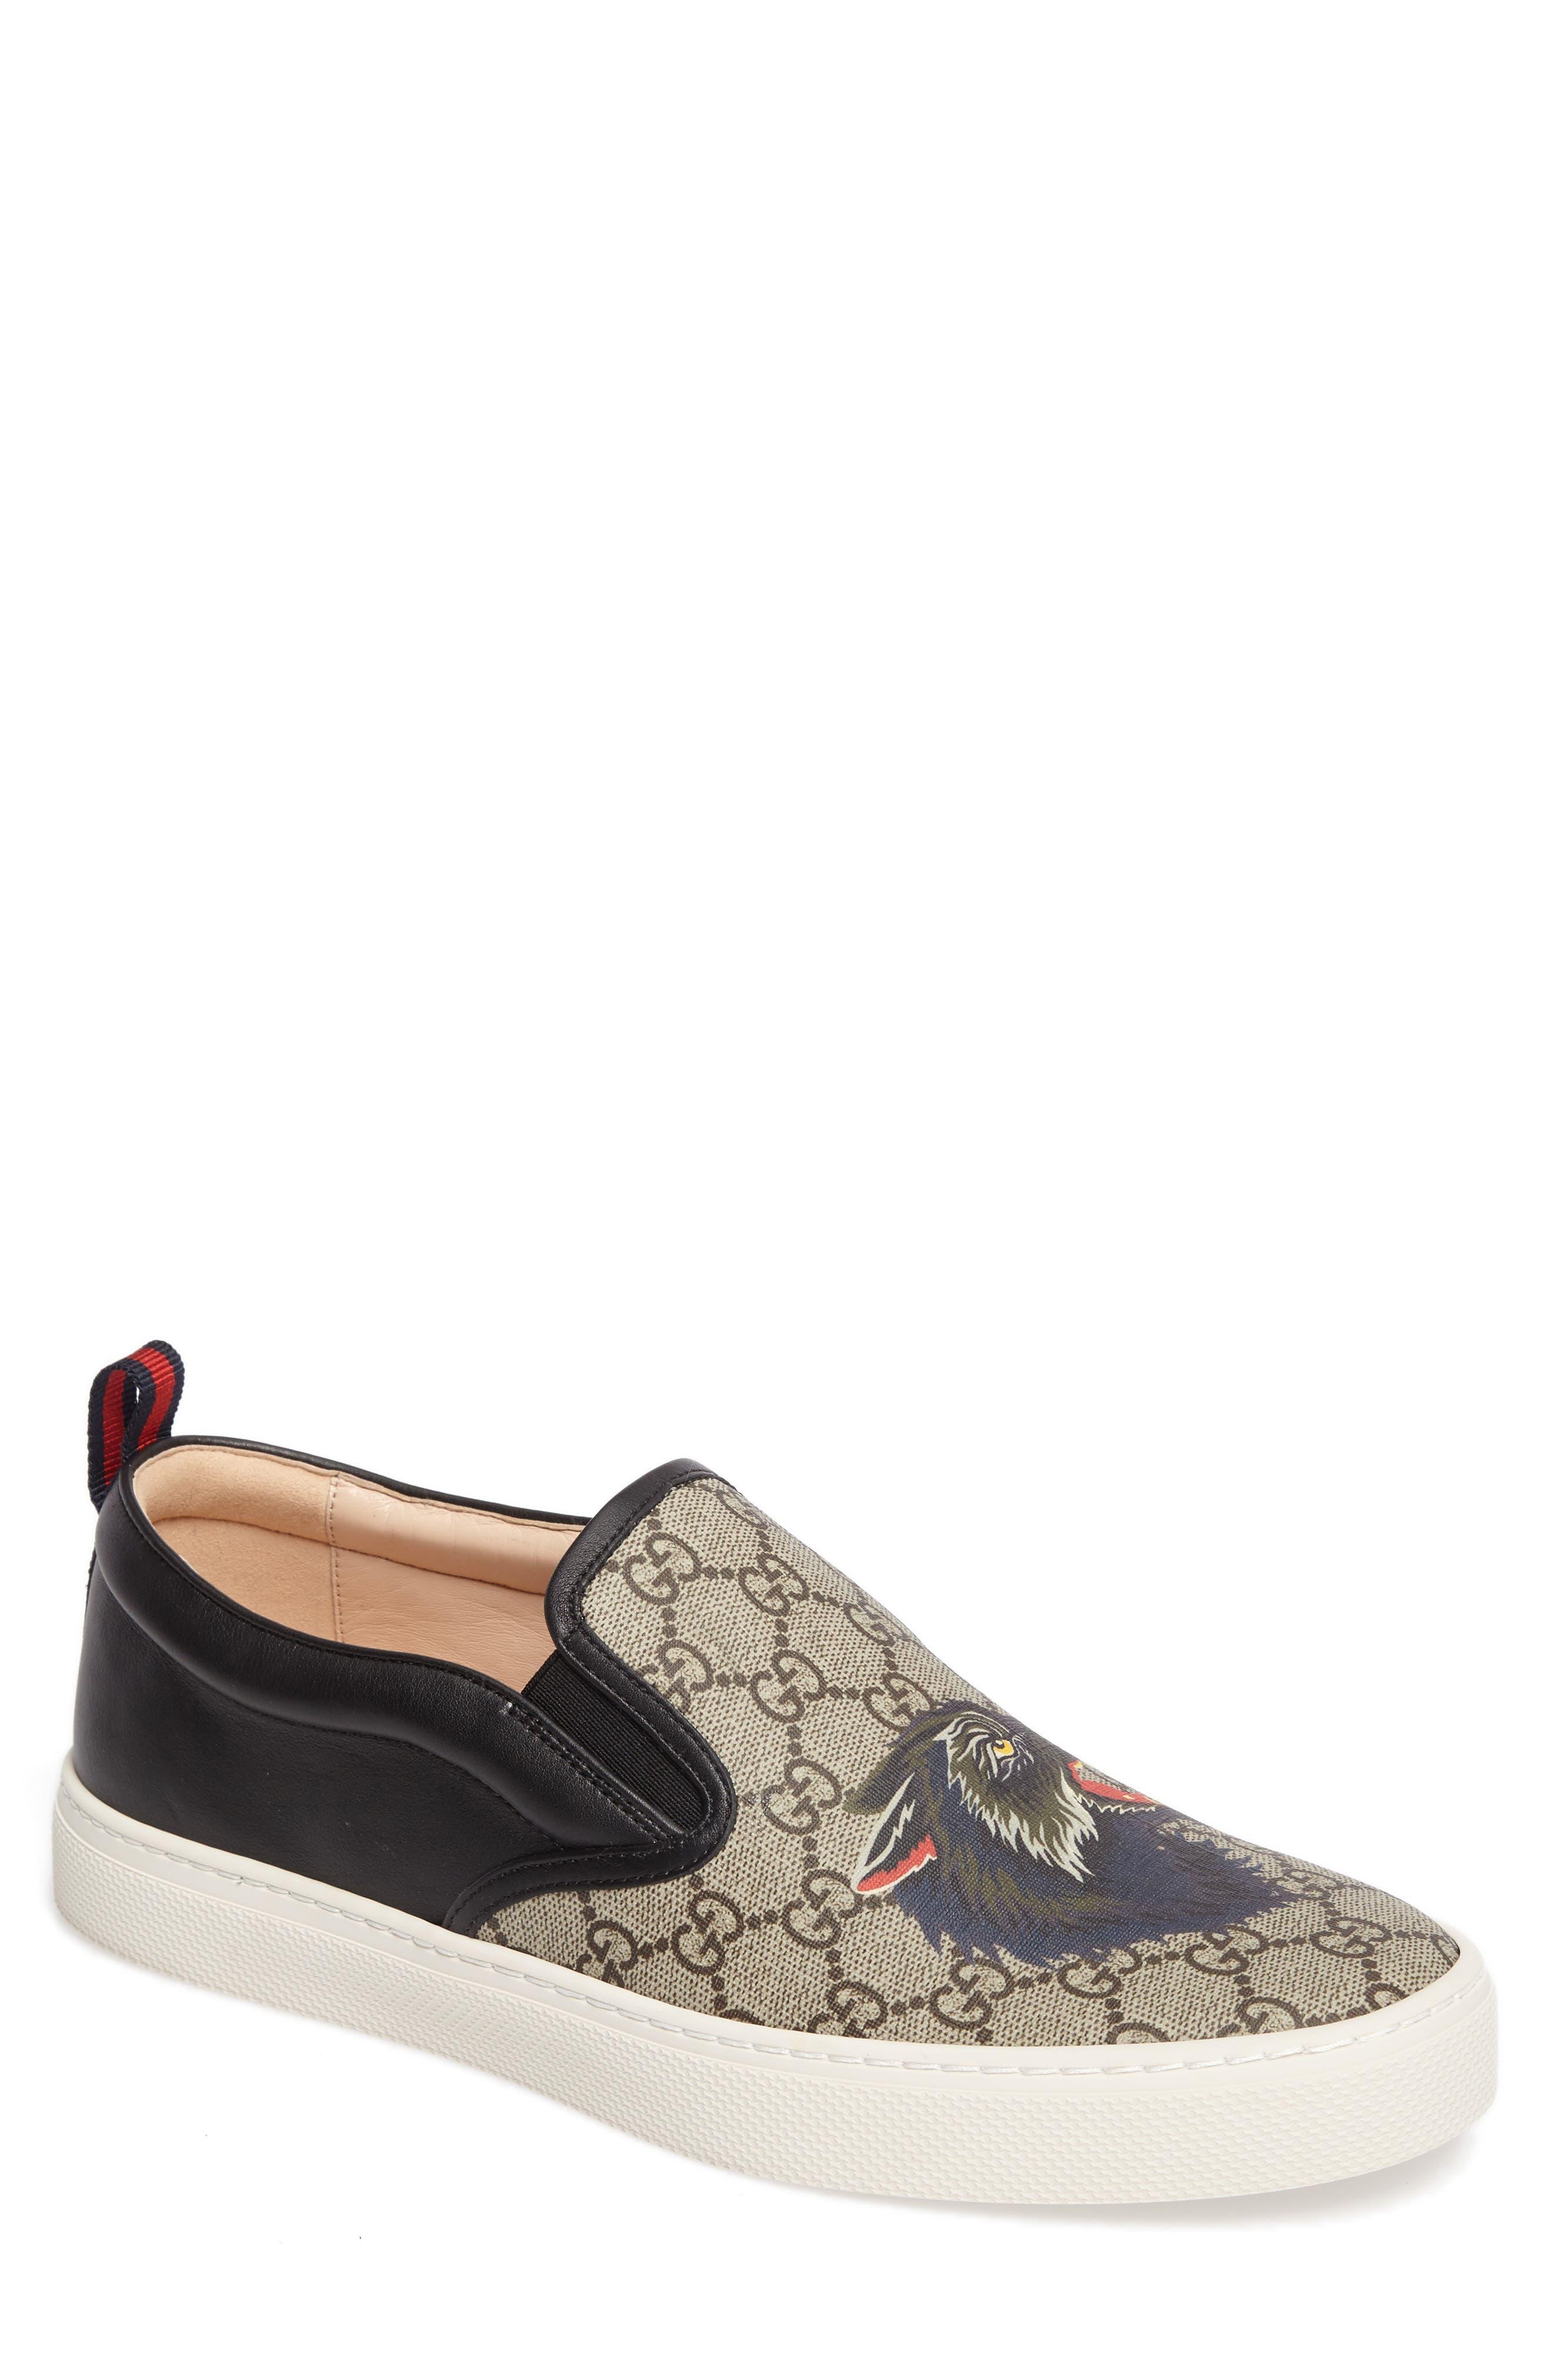 Wolf GG Supreme Slip-On Sneaker,                         Main,                         color, BEIGE/ EBONY